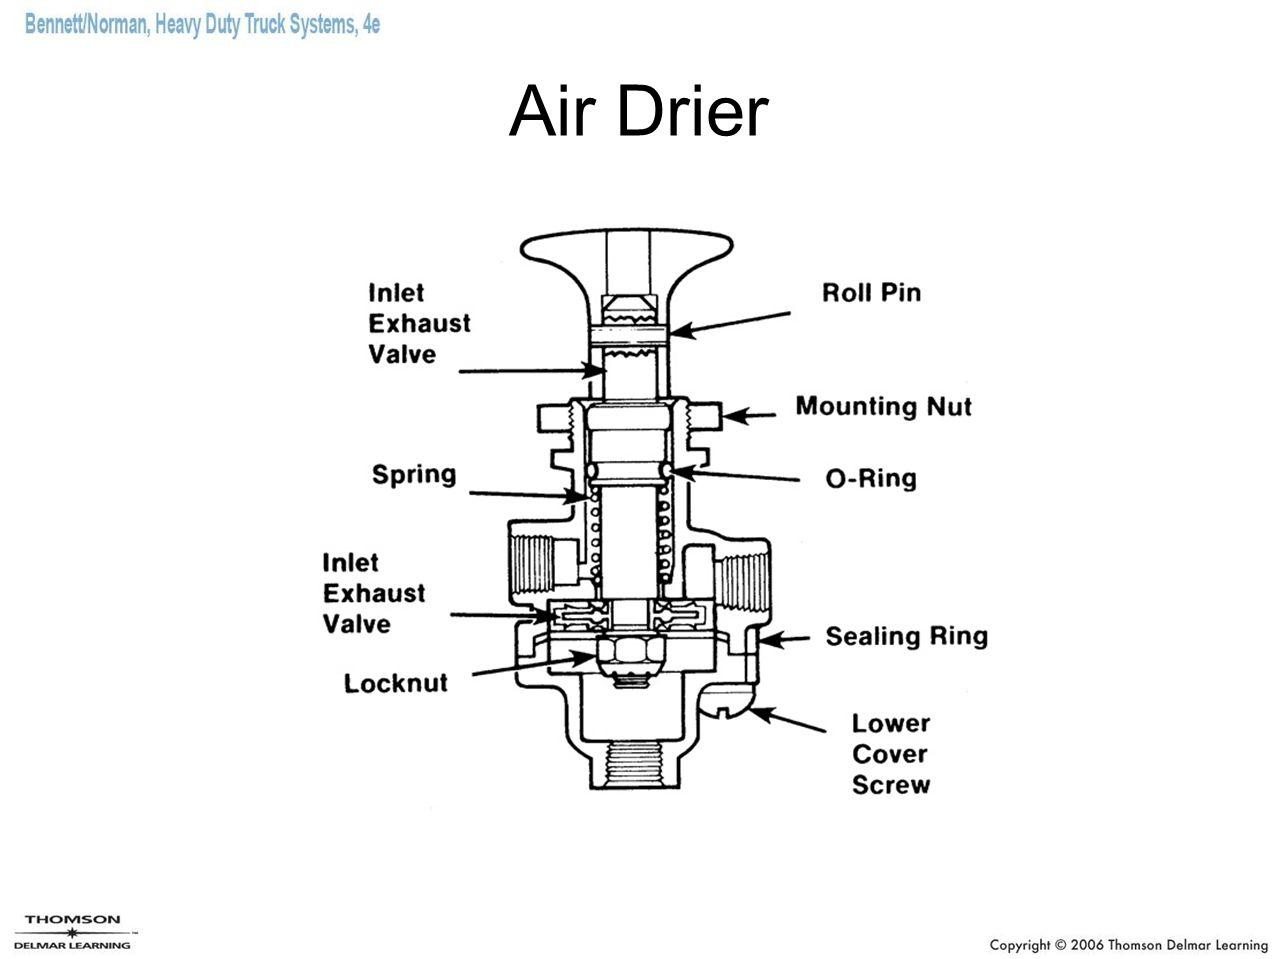 Chapter 31 Air Brake Servicing